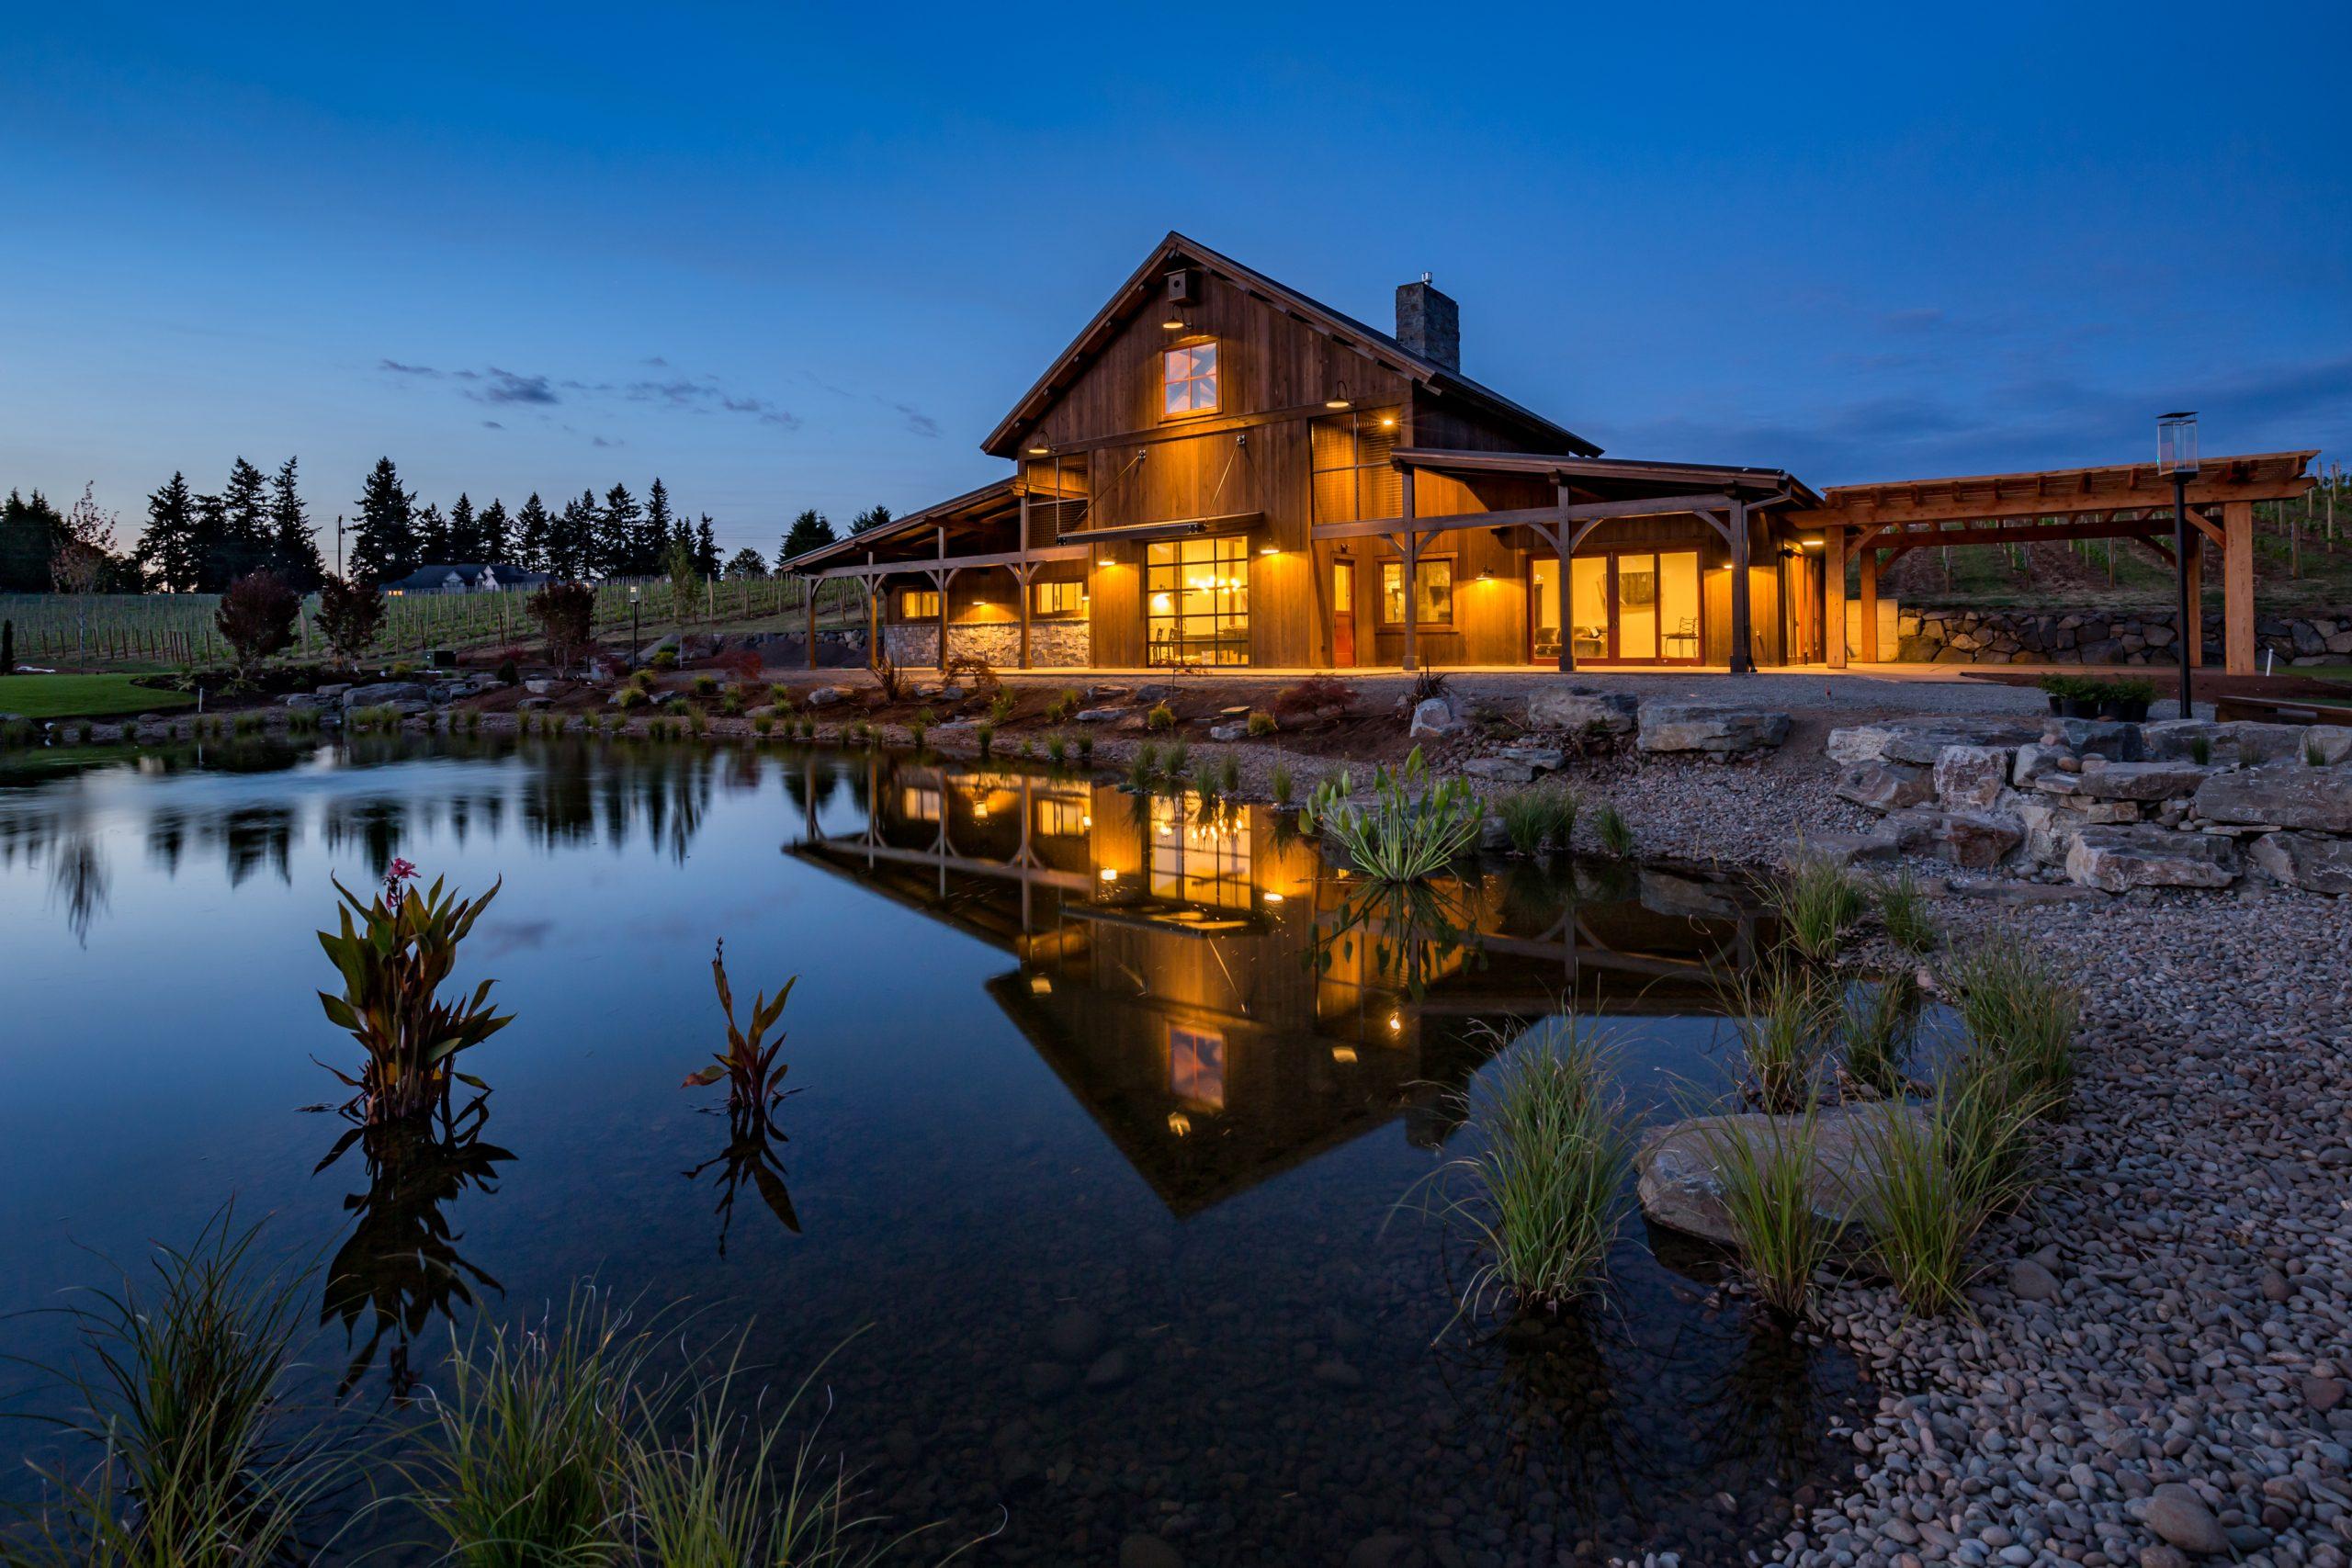 The Barrel House Timber Framed Hybrid Home